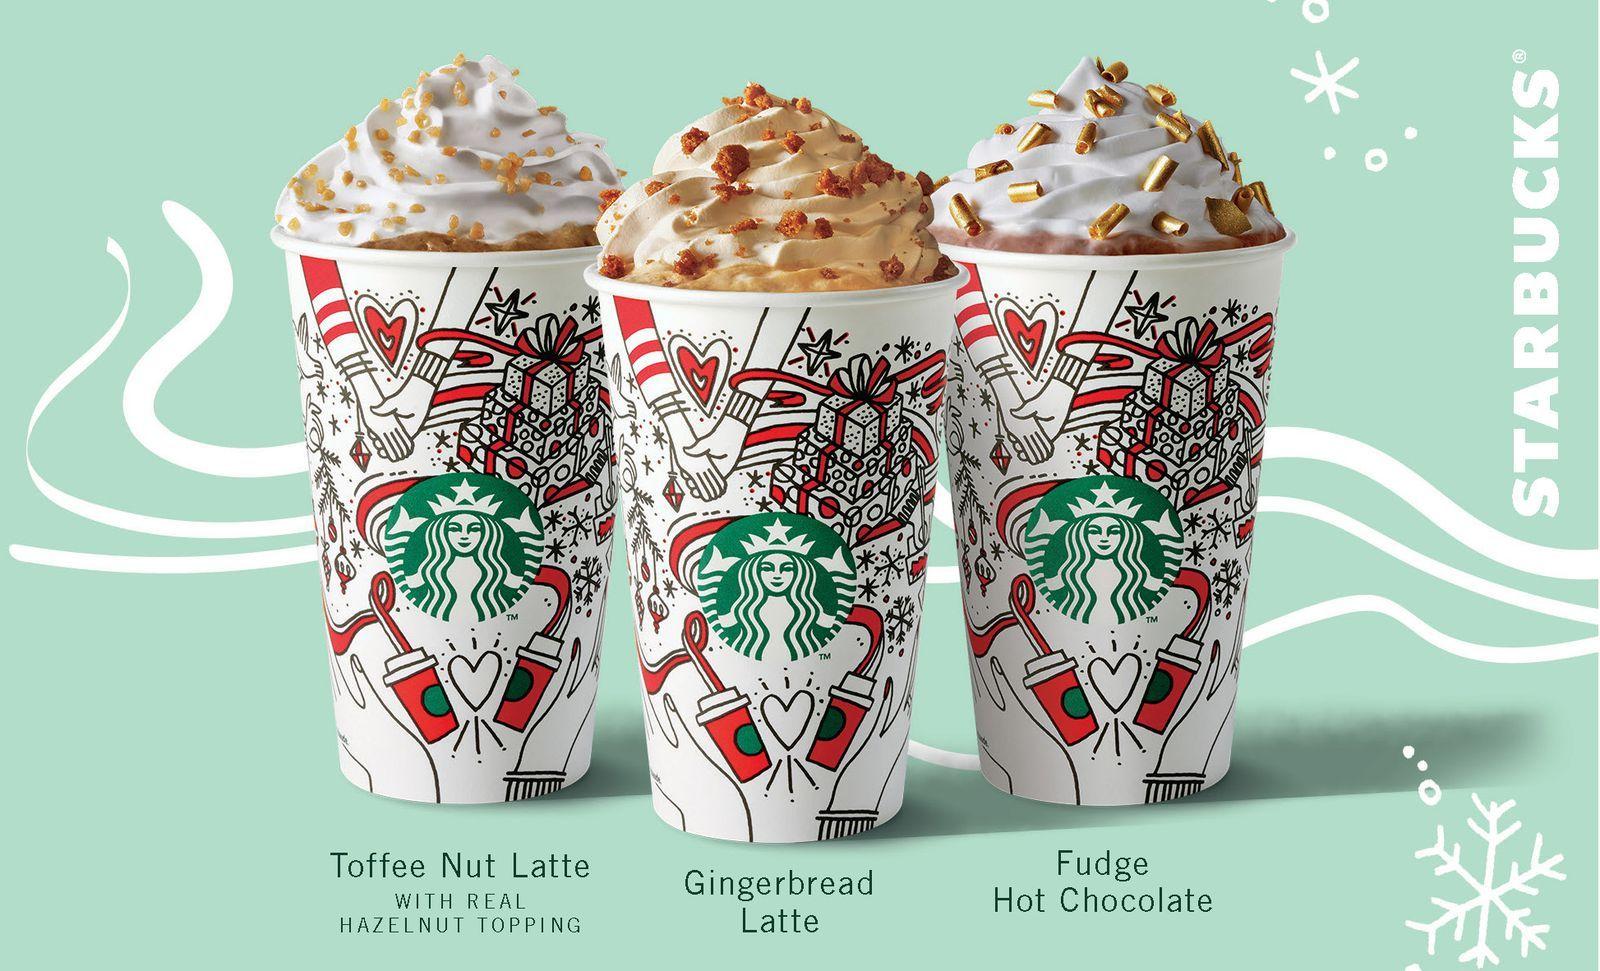 Starbucks Christmas Drinks.Starbucks Christmas Menu Is Here And There S A Brand New